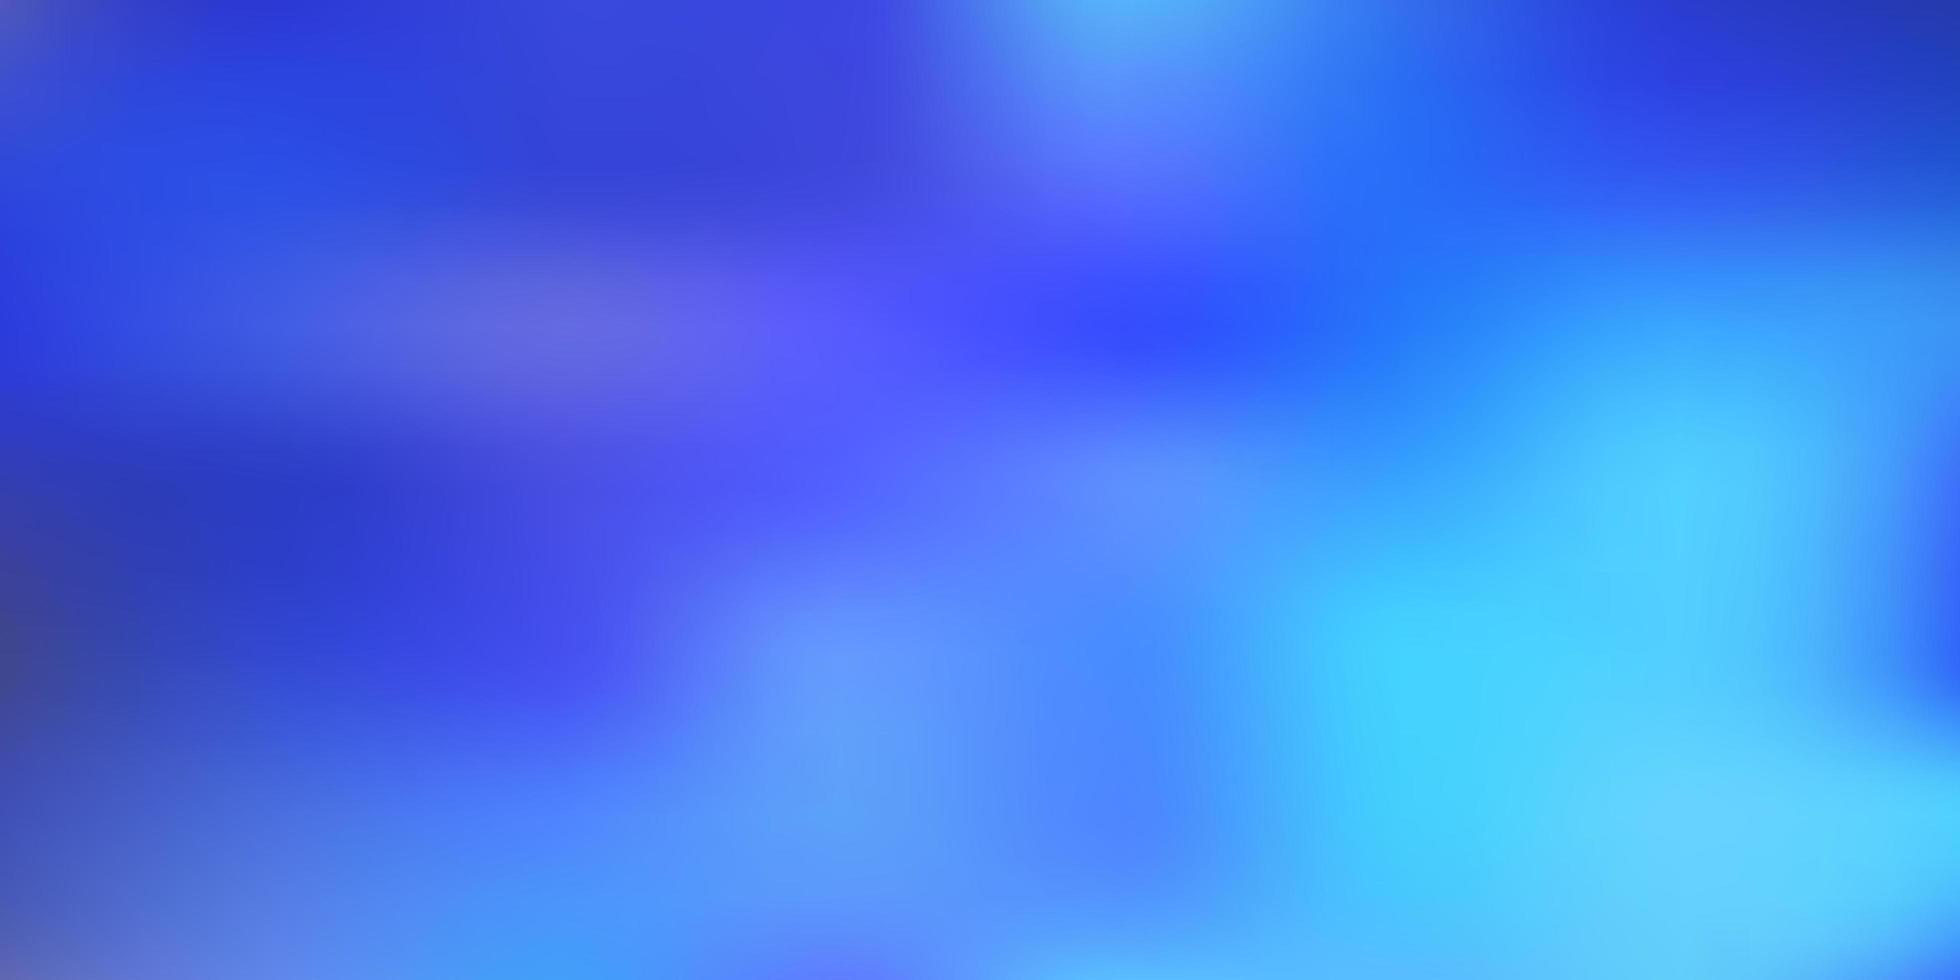 Light blue abstract blur layout. vector